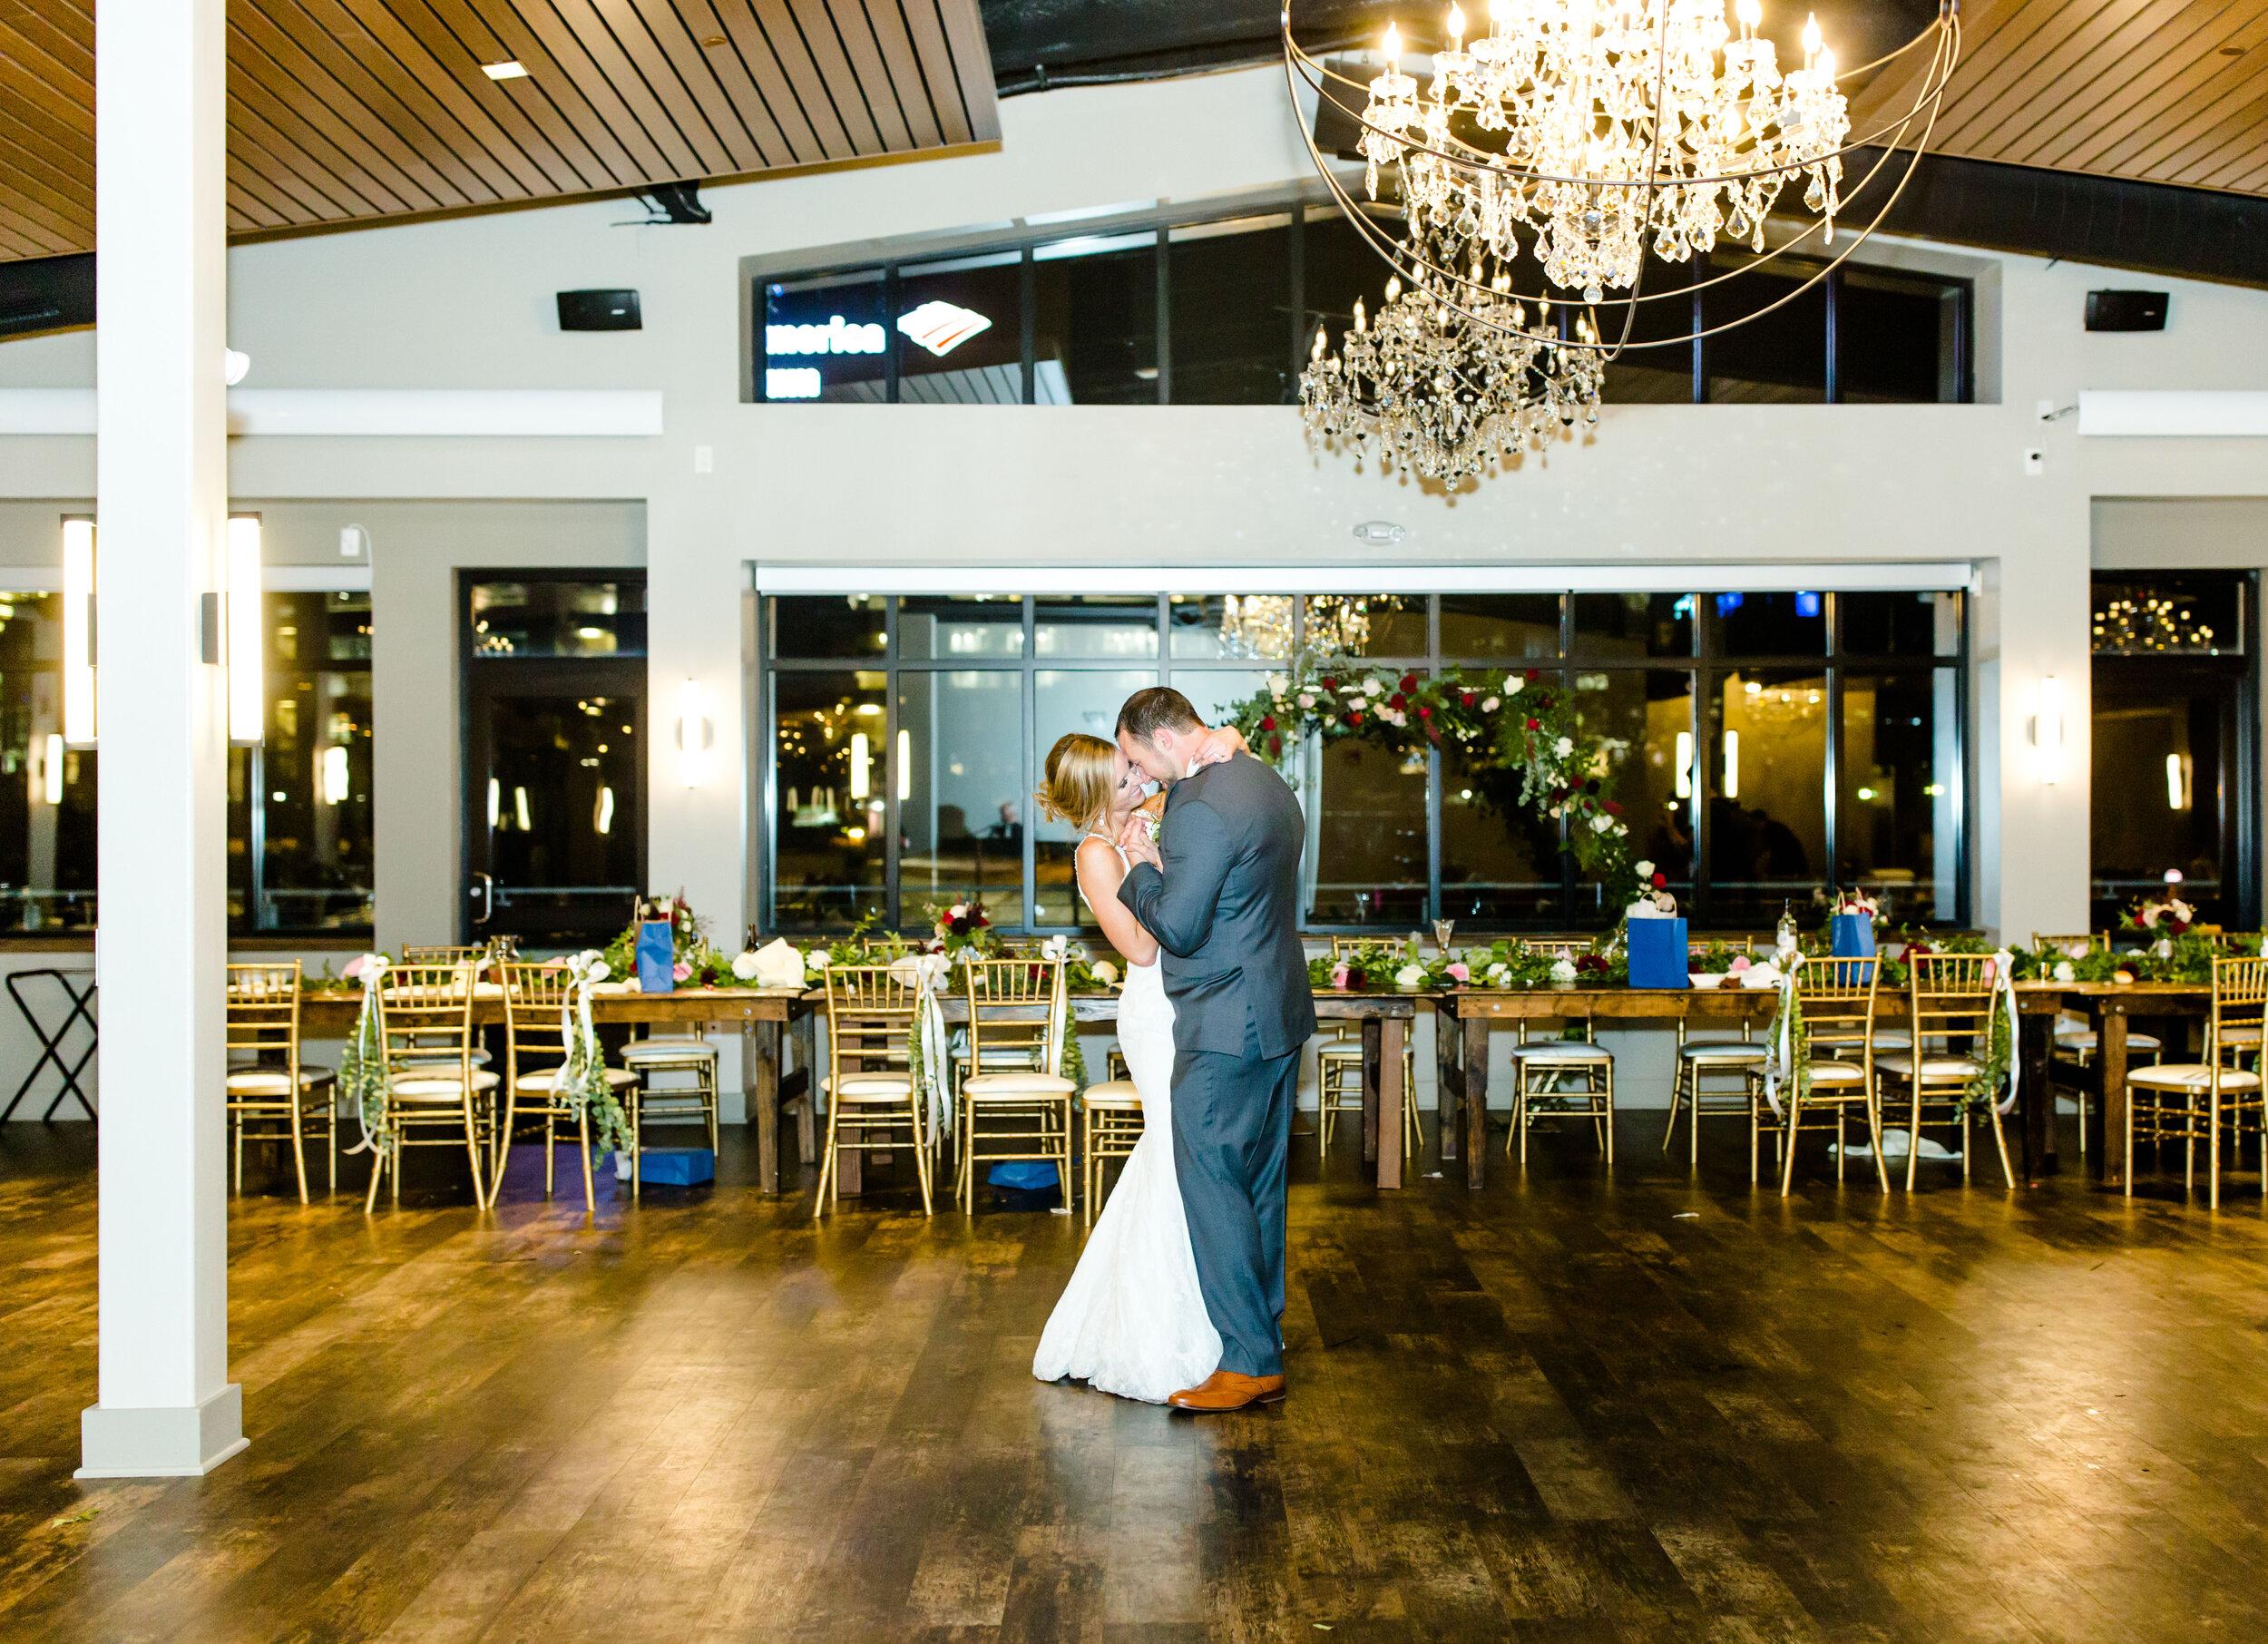 Couple's last dance